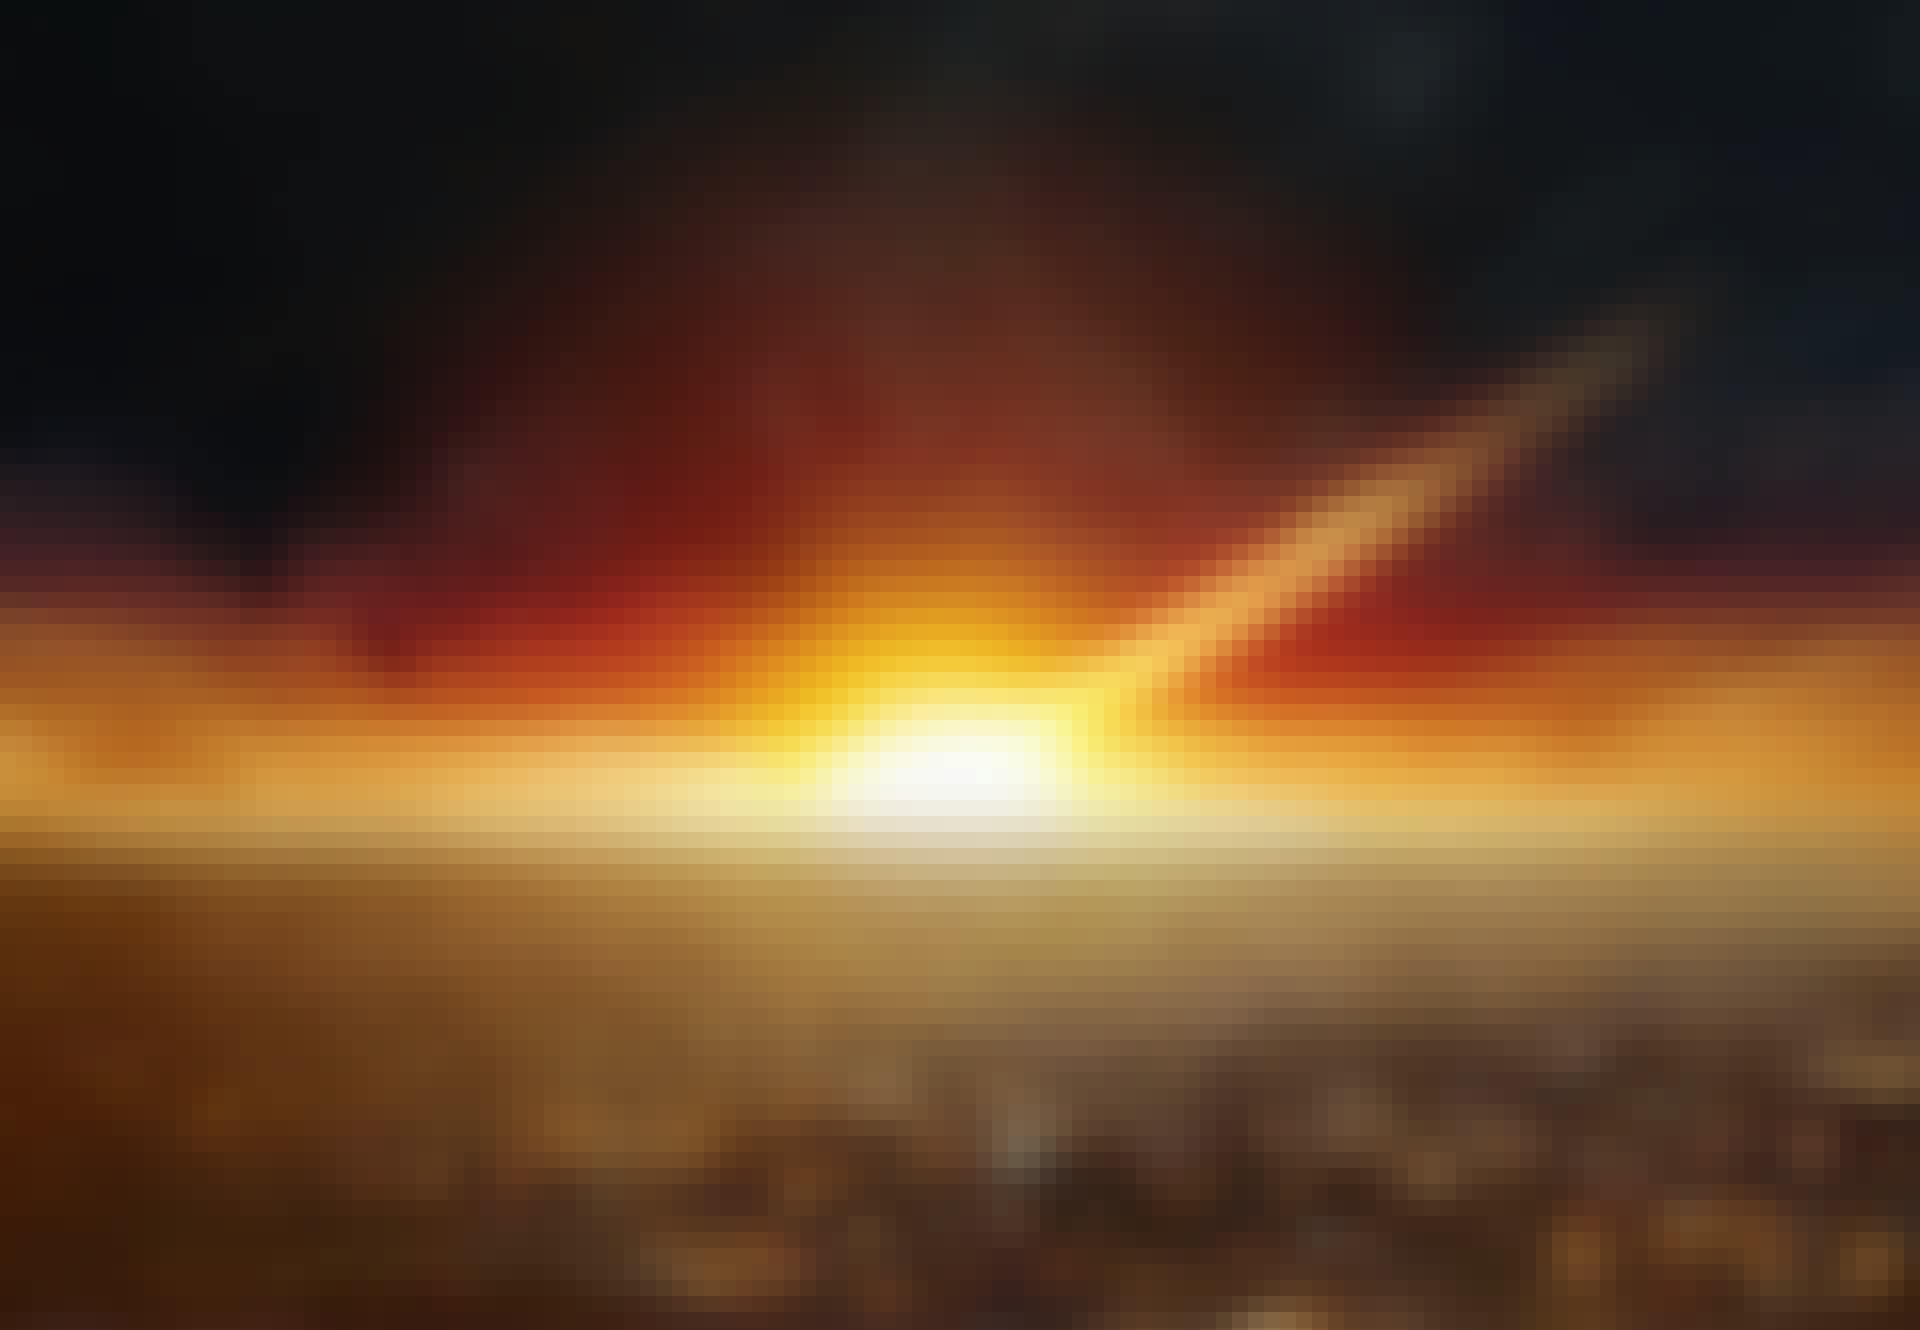 Asteroid träffar jorden